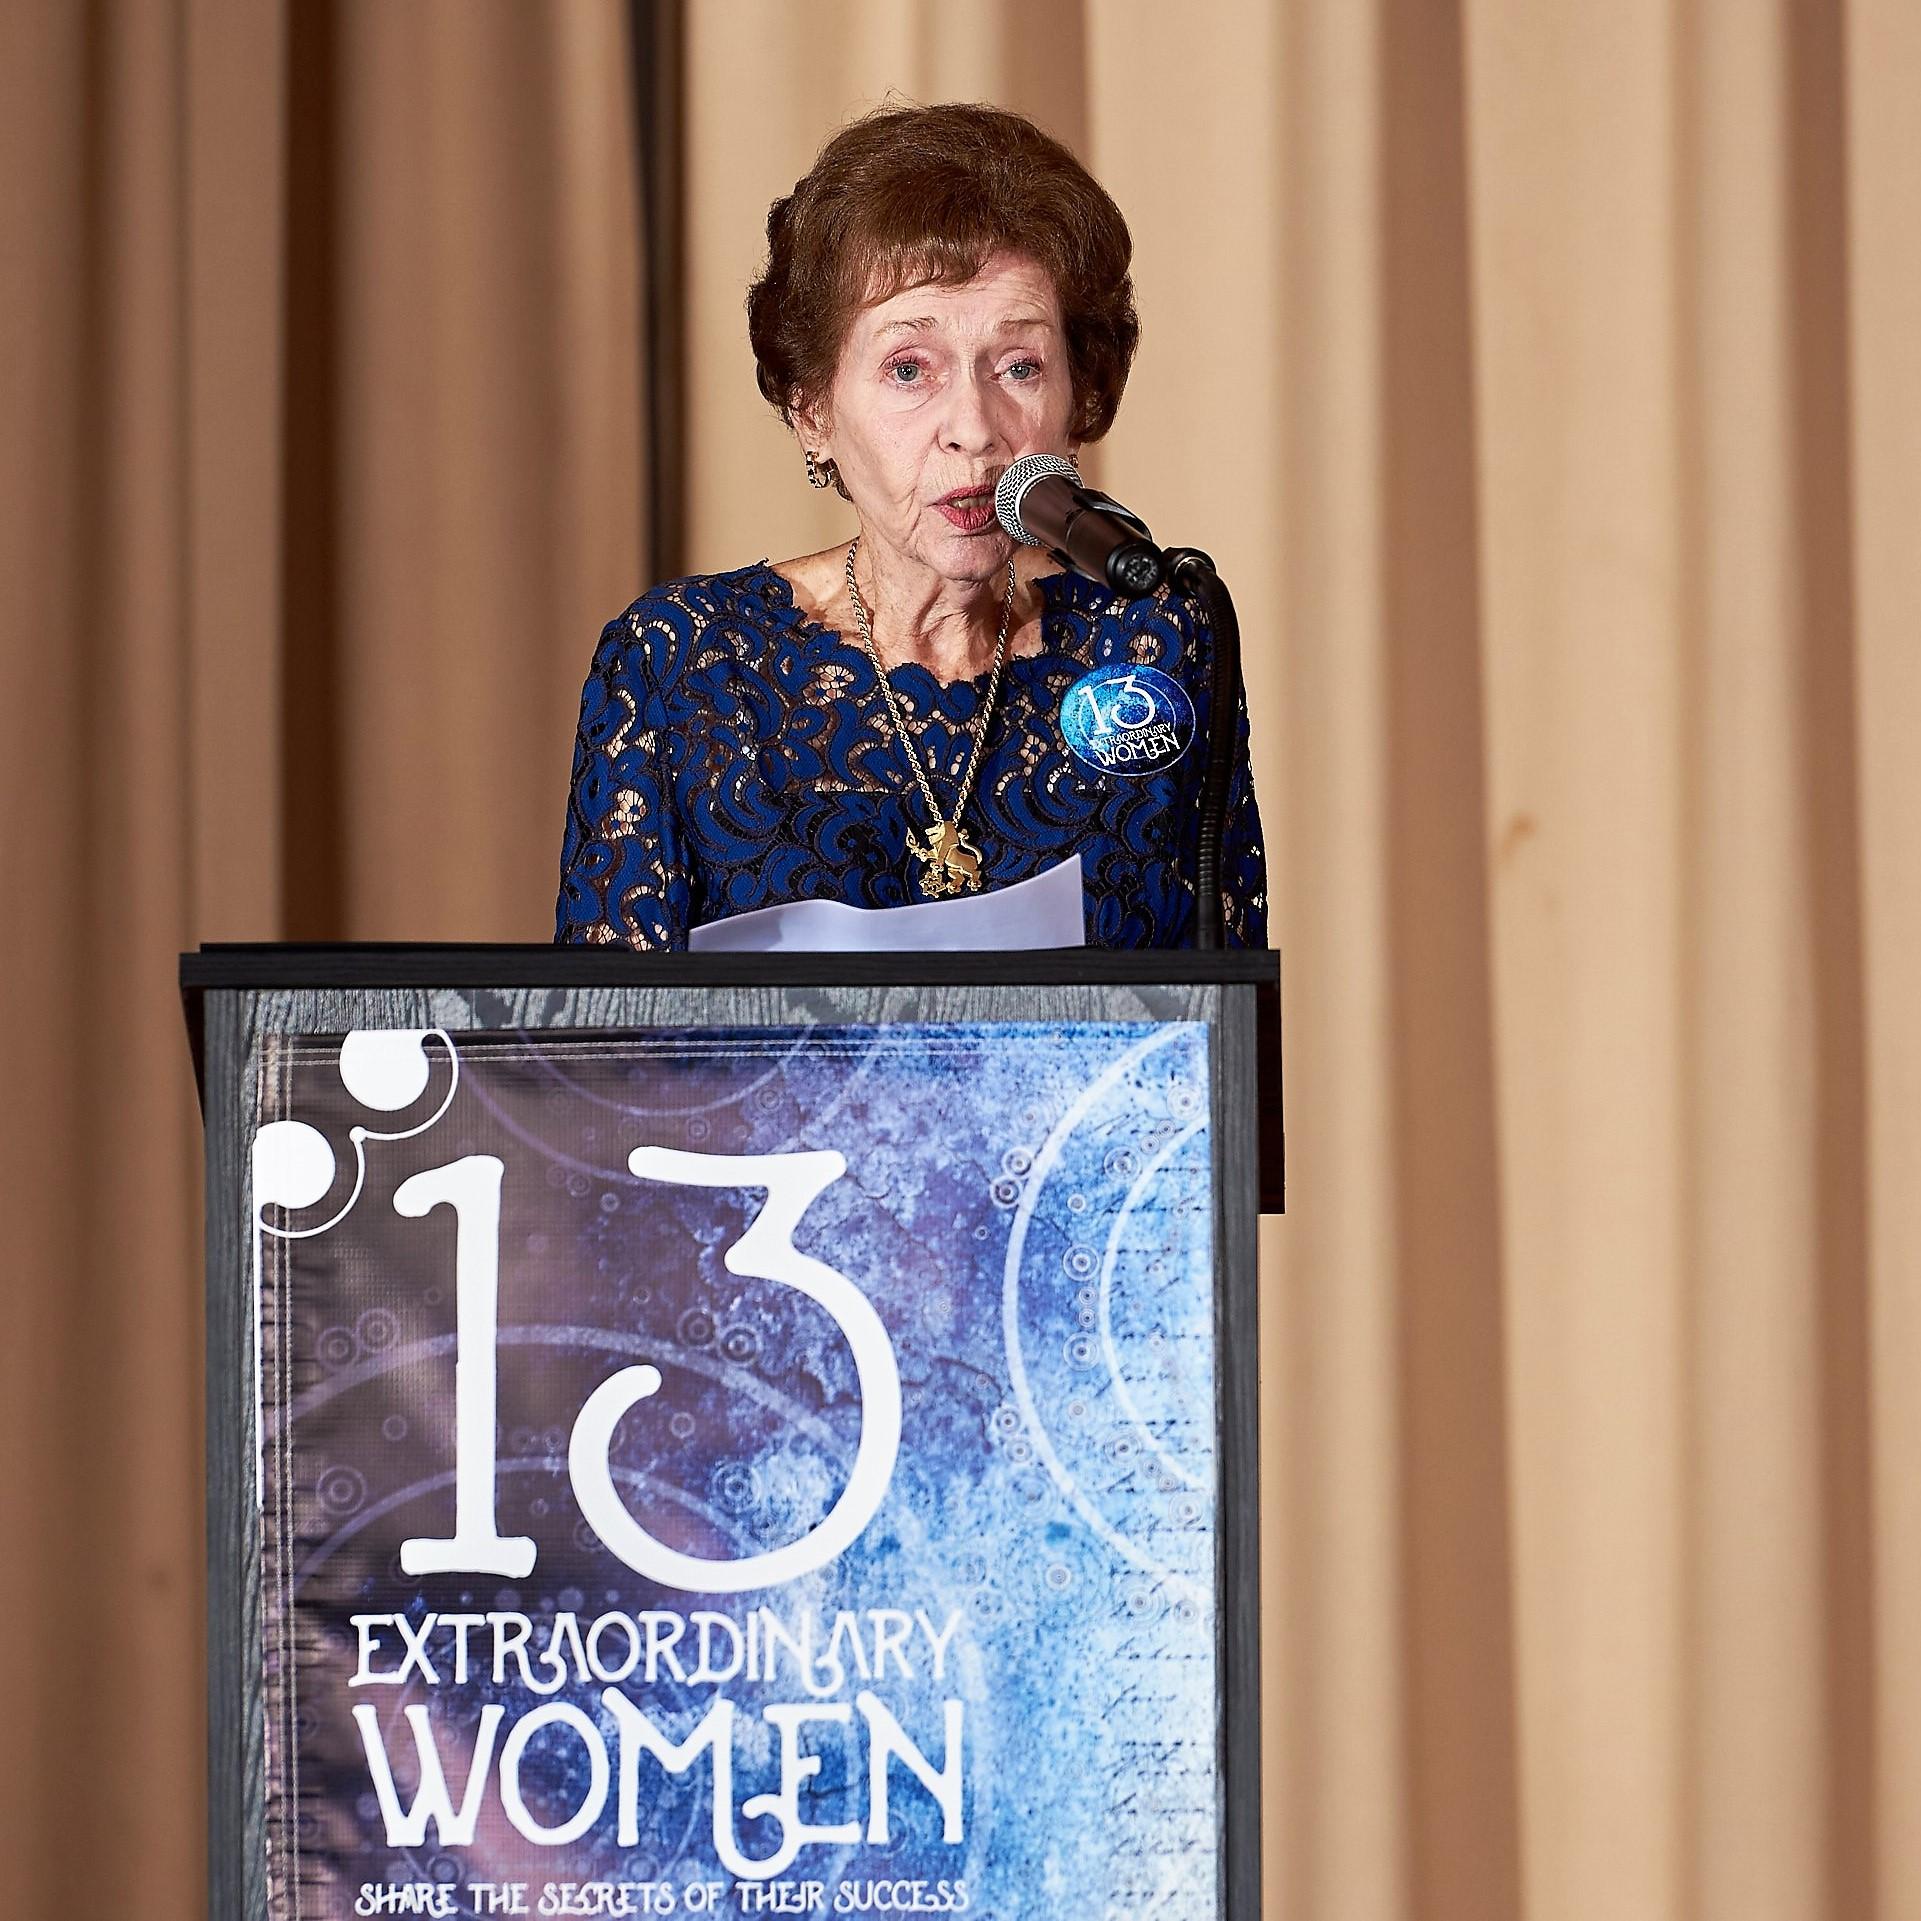 Terri Union accepts the Eileen Schwartz Award at 13 Extraordinary Women